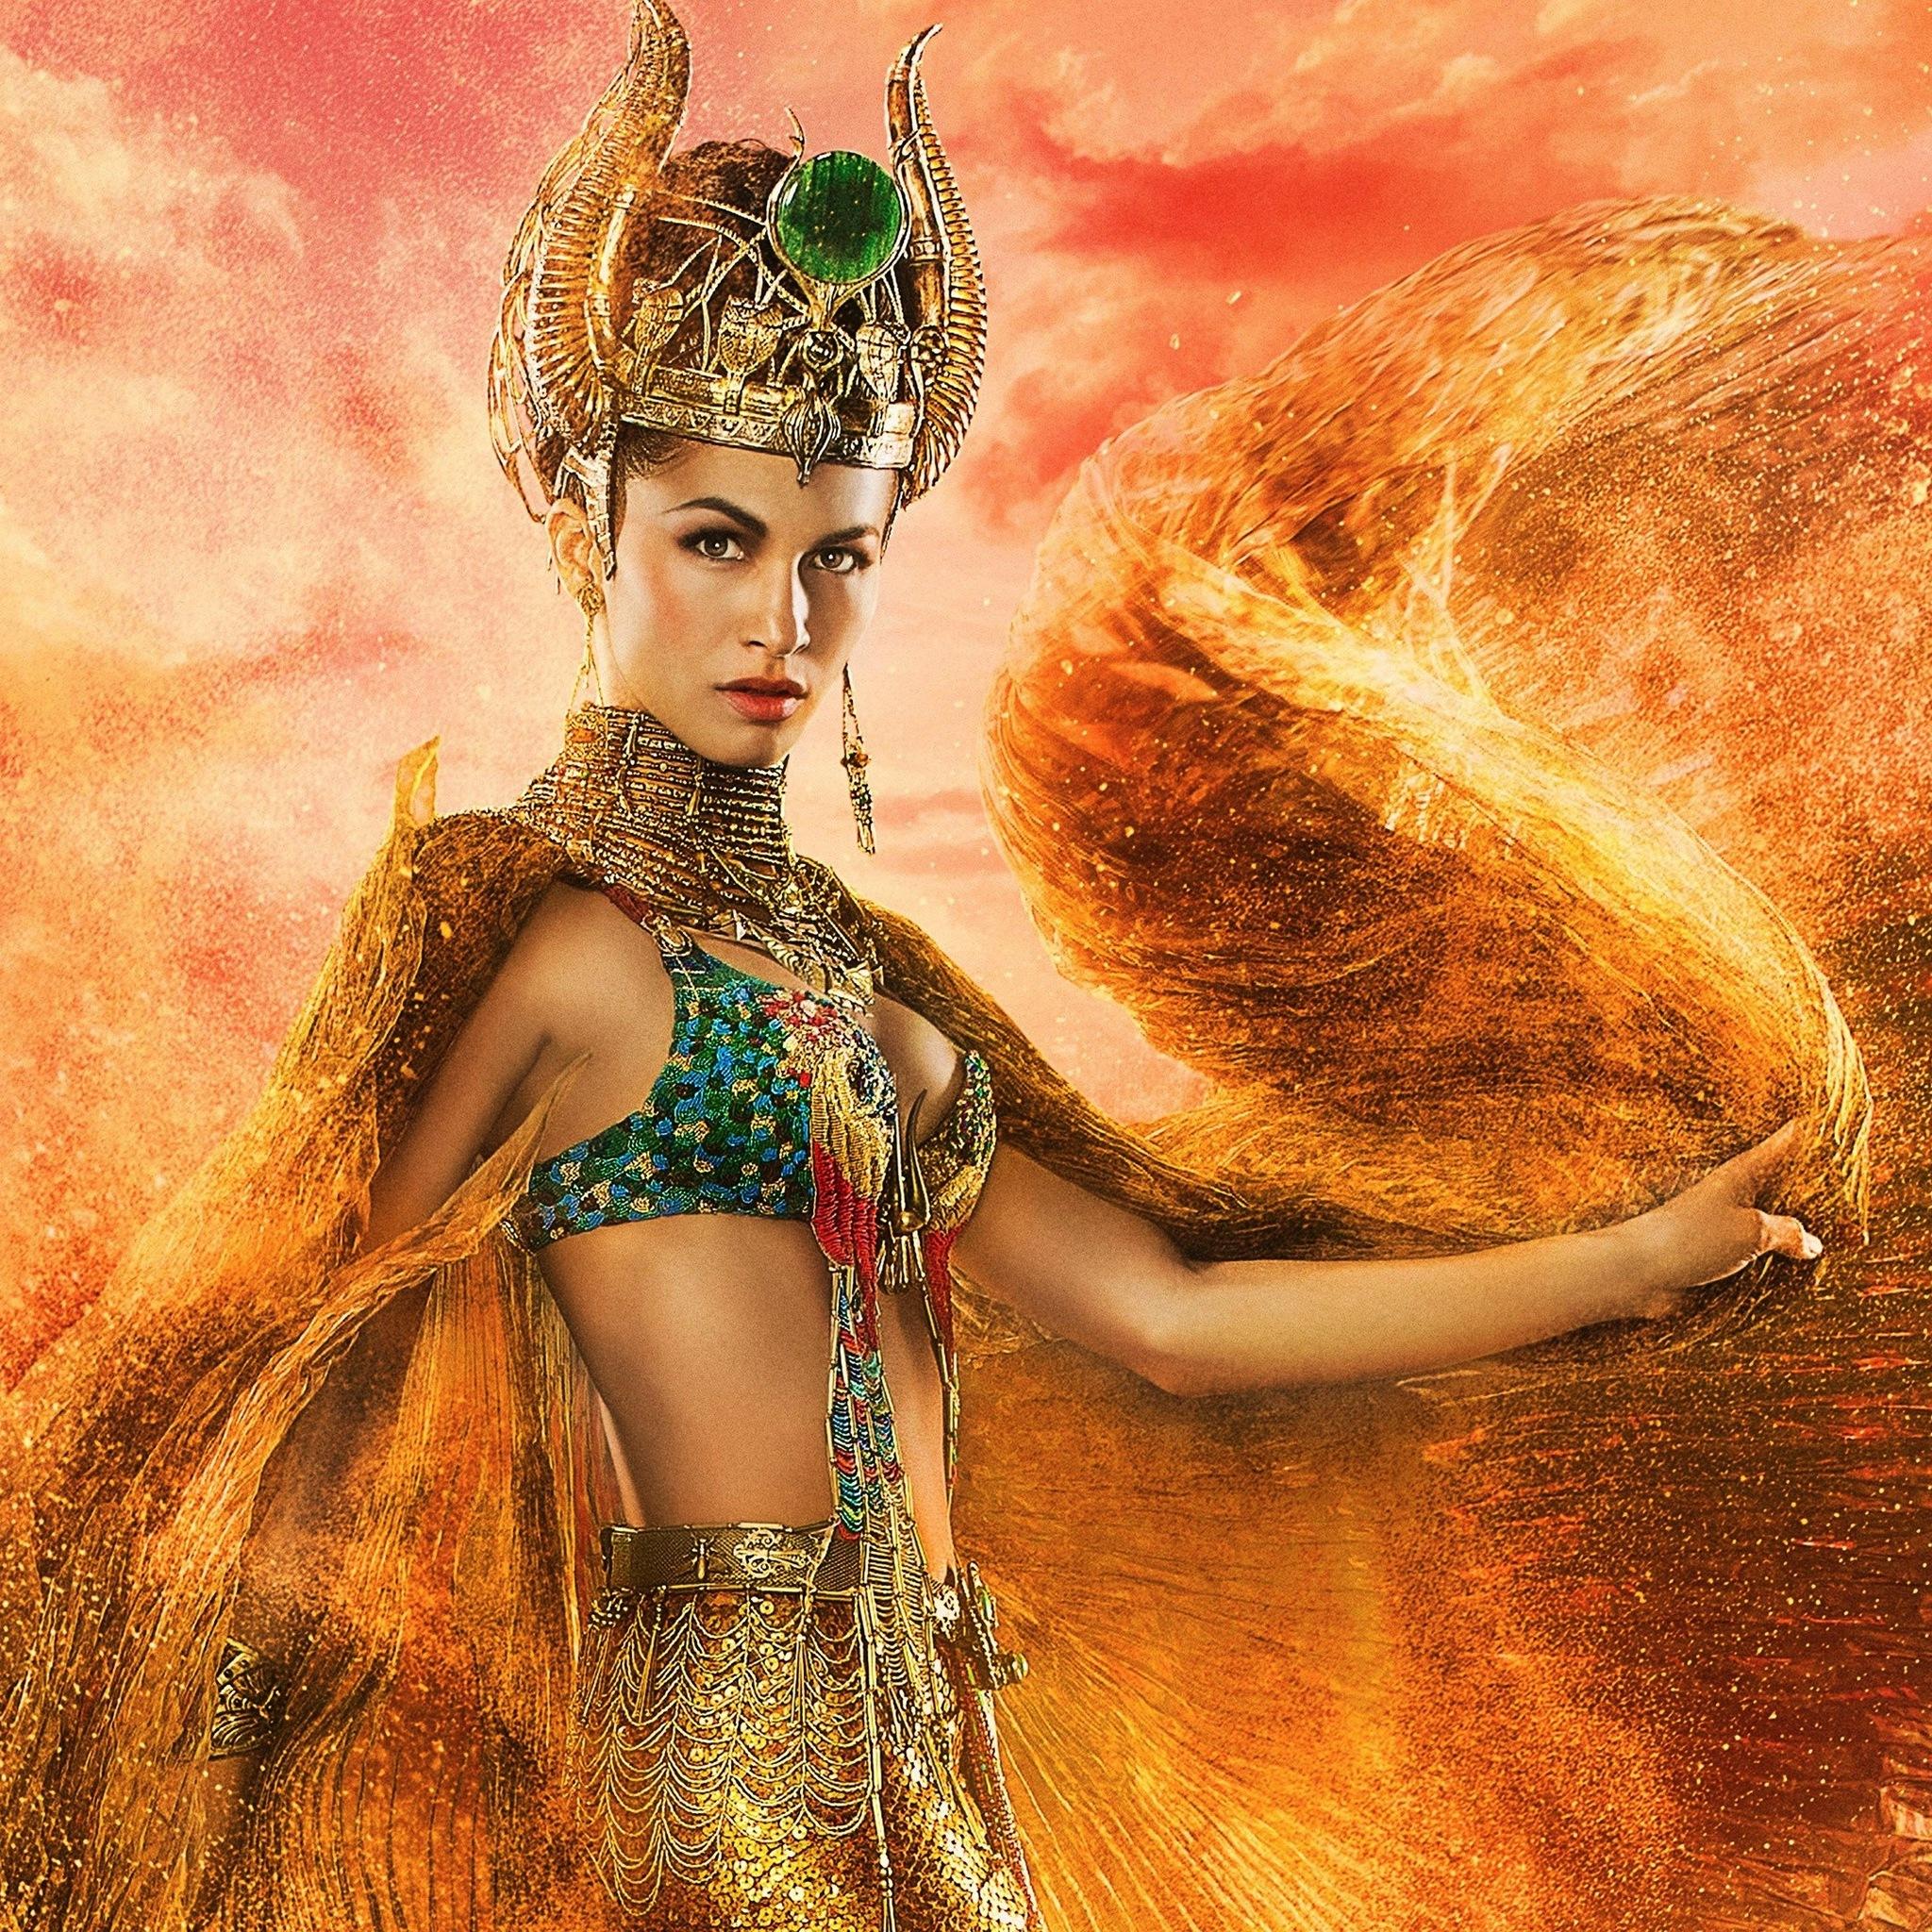 2048x2048 Hathor Gods Of Egypt Ipad Air Hd 4k Wallpapers